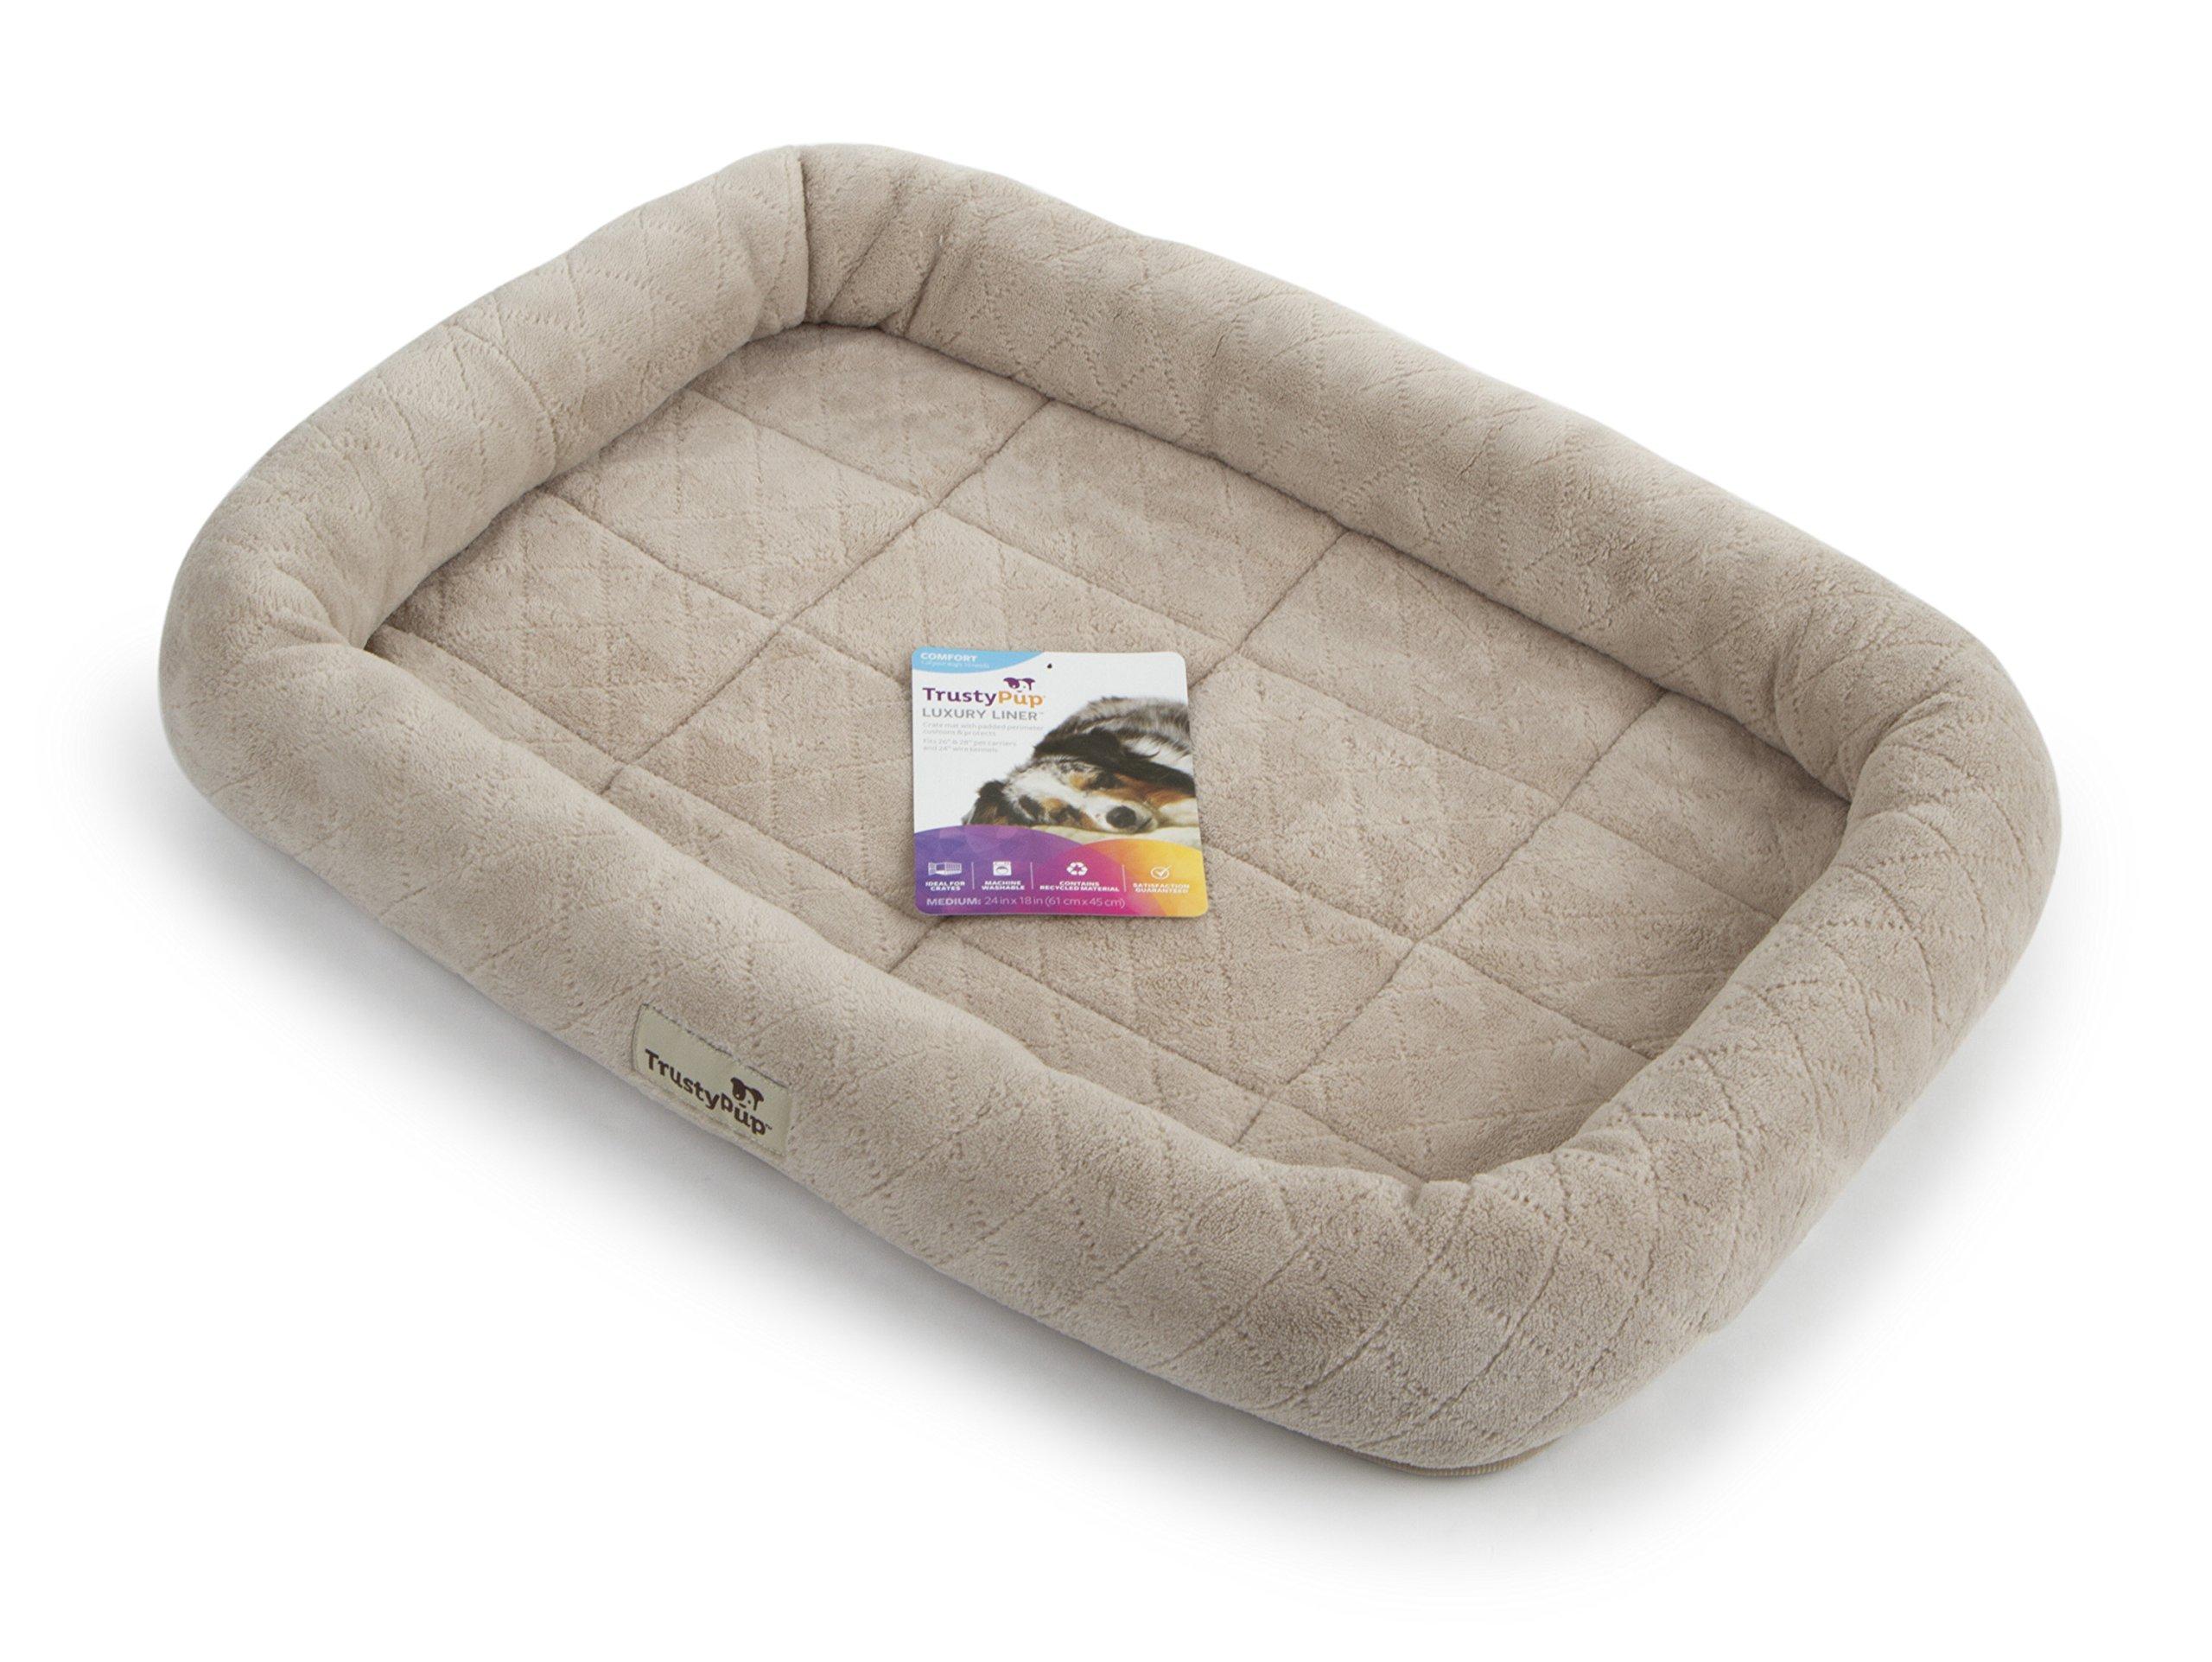 TrustyPup 65079-99975-004 Luxury Liner Bolstered Crate Mat, Medium